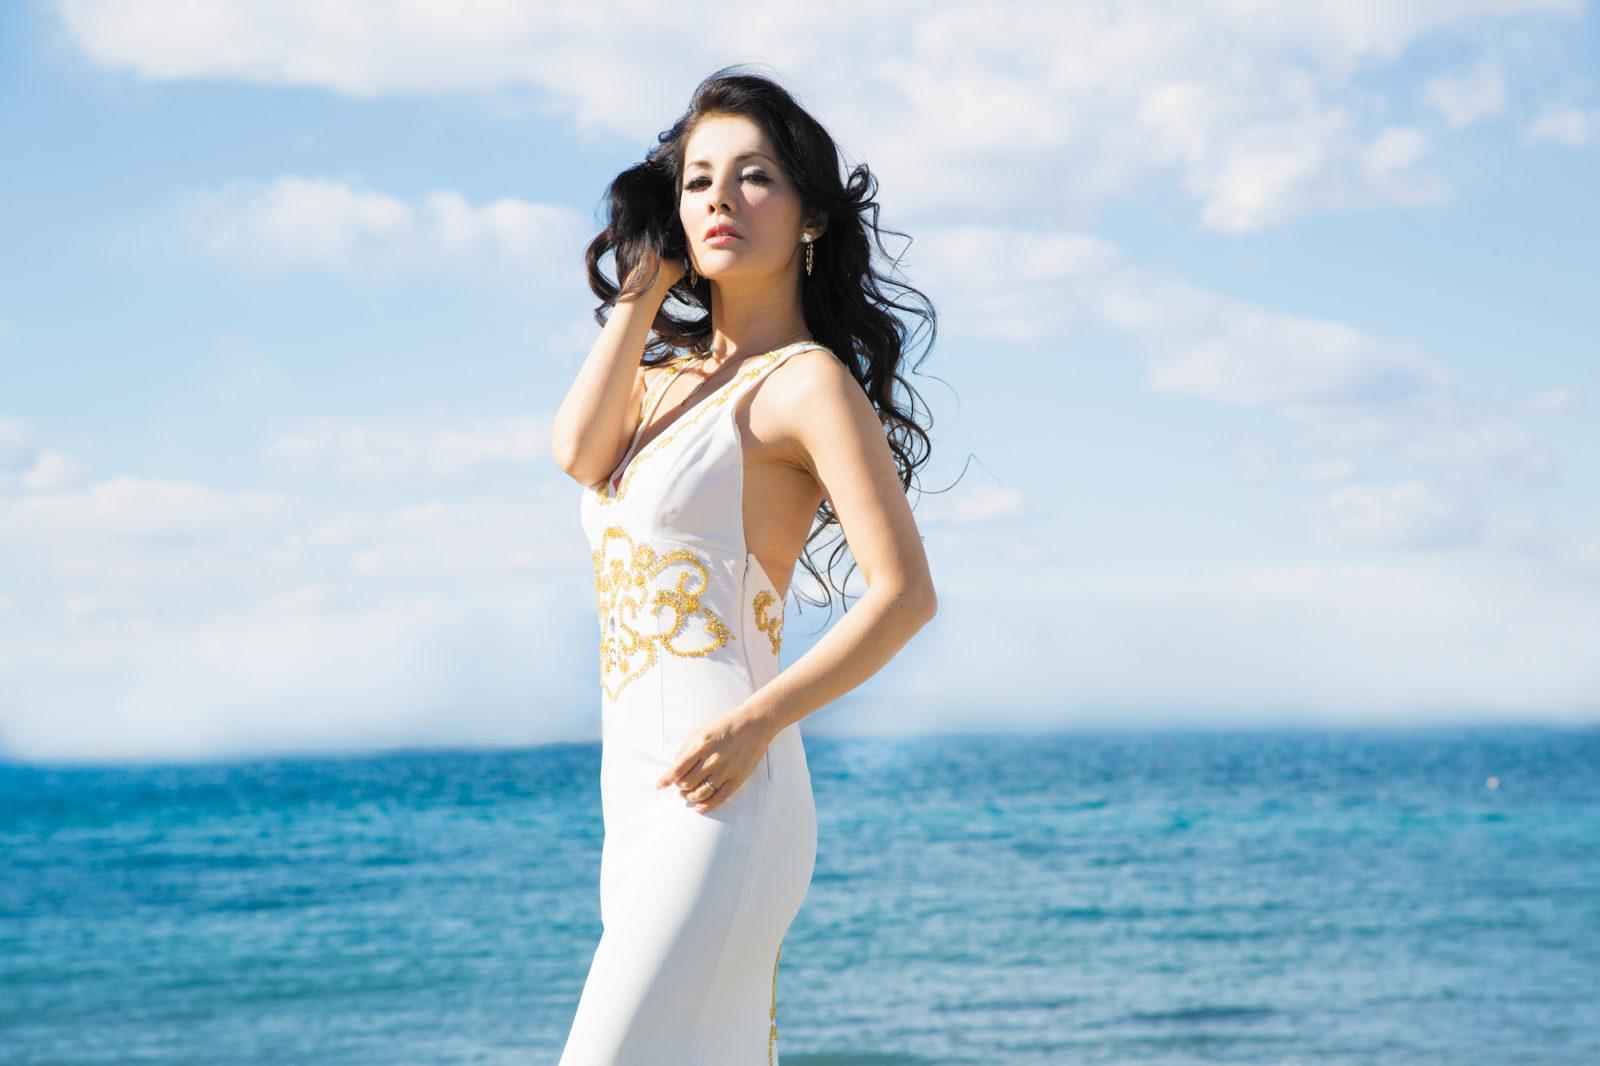 sexy singerの代名詞・Meyou、10年振りのソロアルバム「〜Sea muse〜」をリリース!Shinnosuke、HI-D、Shyoudog(韻シスト)、Shing02ら豪華メンバー迎えるサムネイル画像